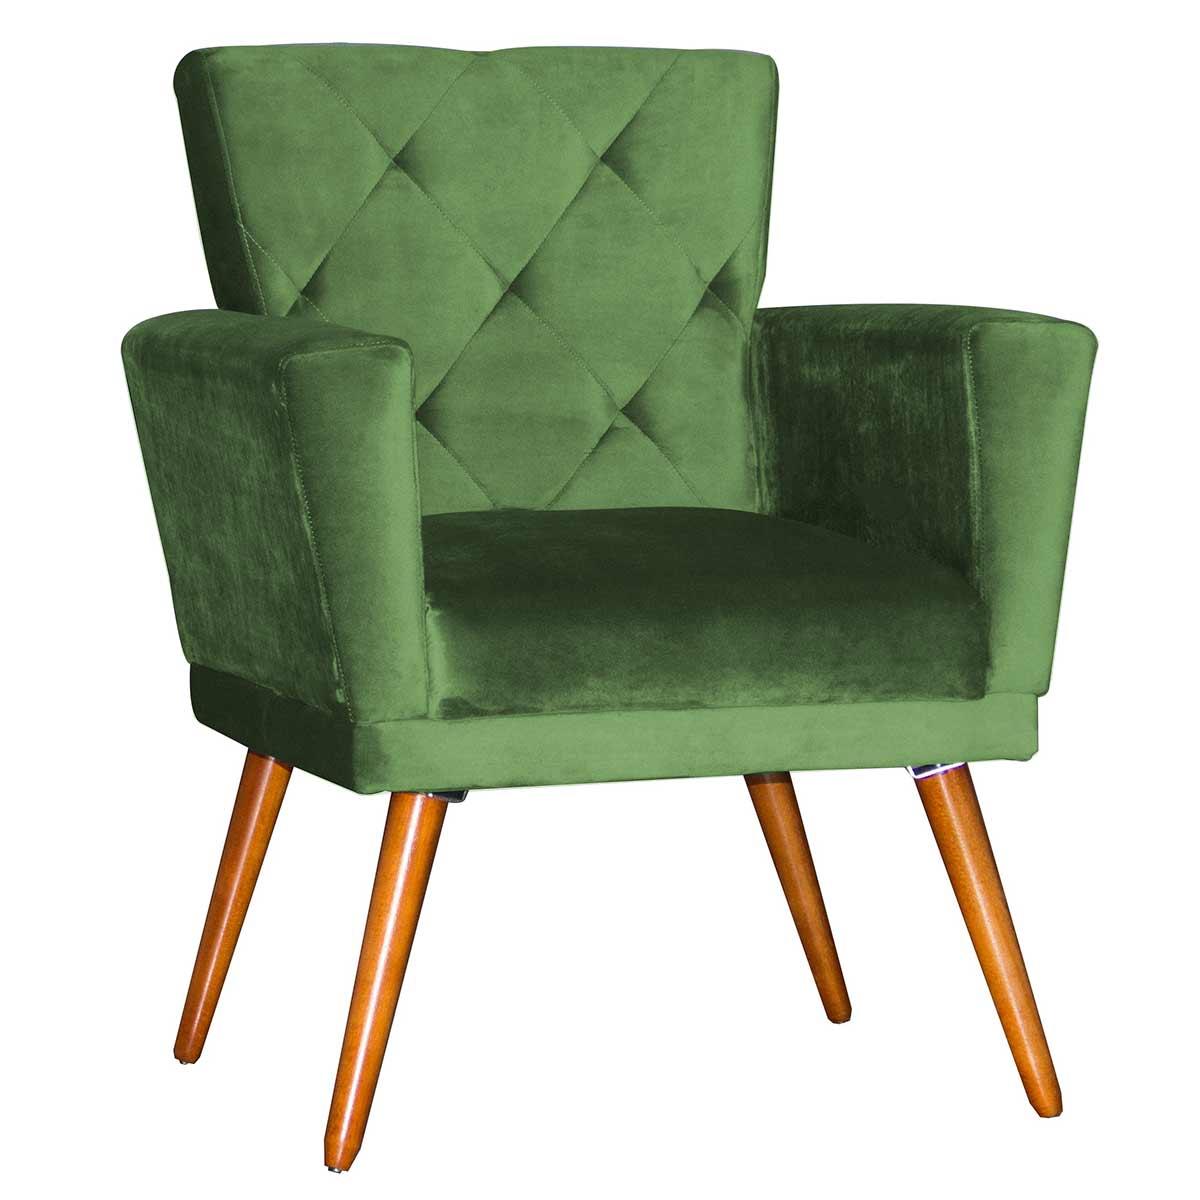 Poltrona Decorativa Camila Pé Palito Deluxe Verde